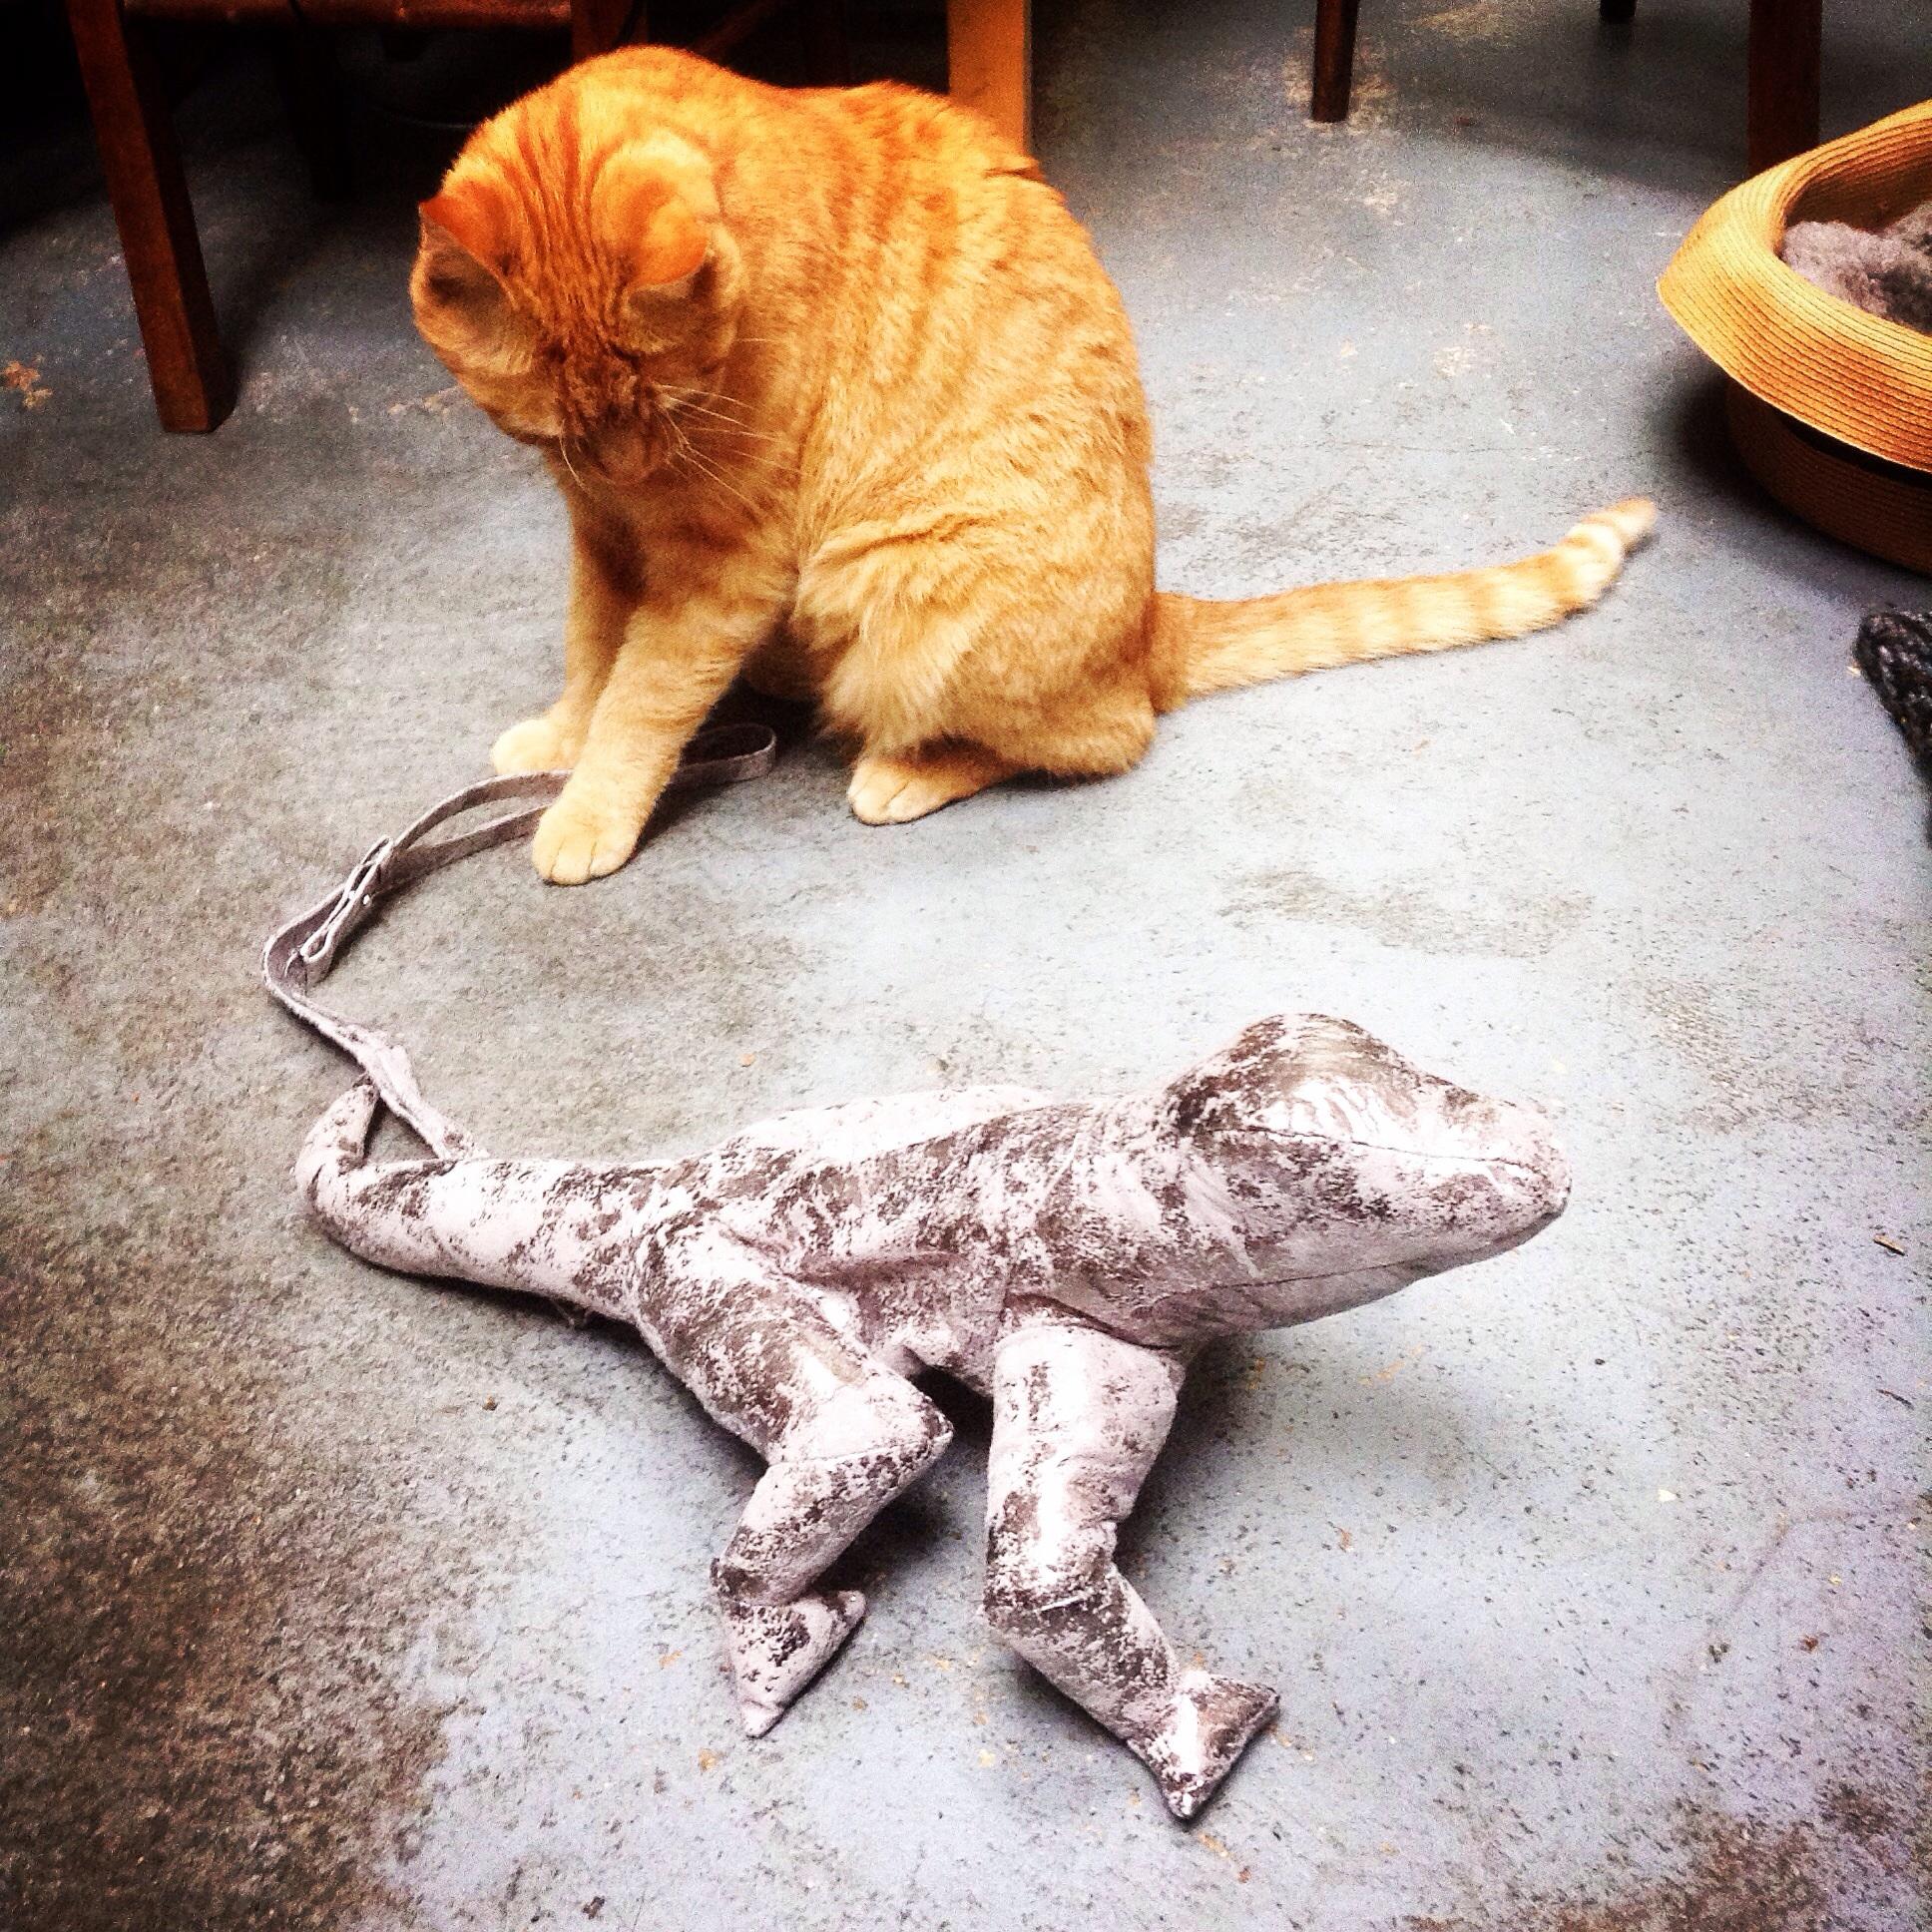 My cat Taggart meeting my new Christopher Raeburn lizard bag